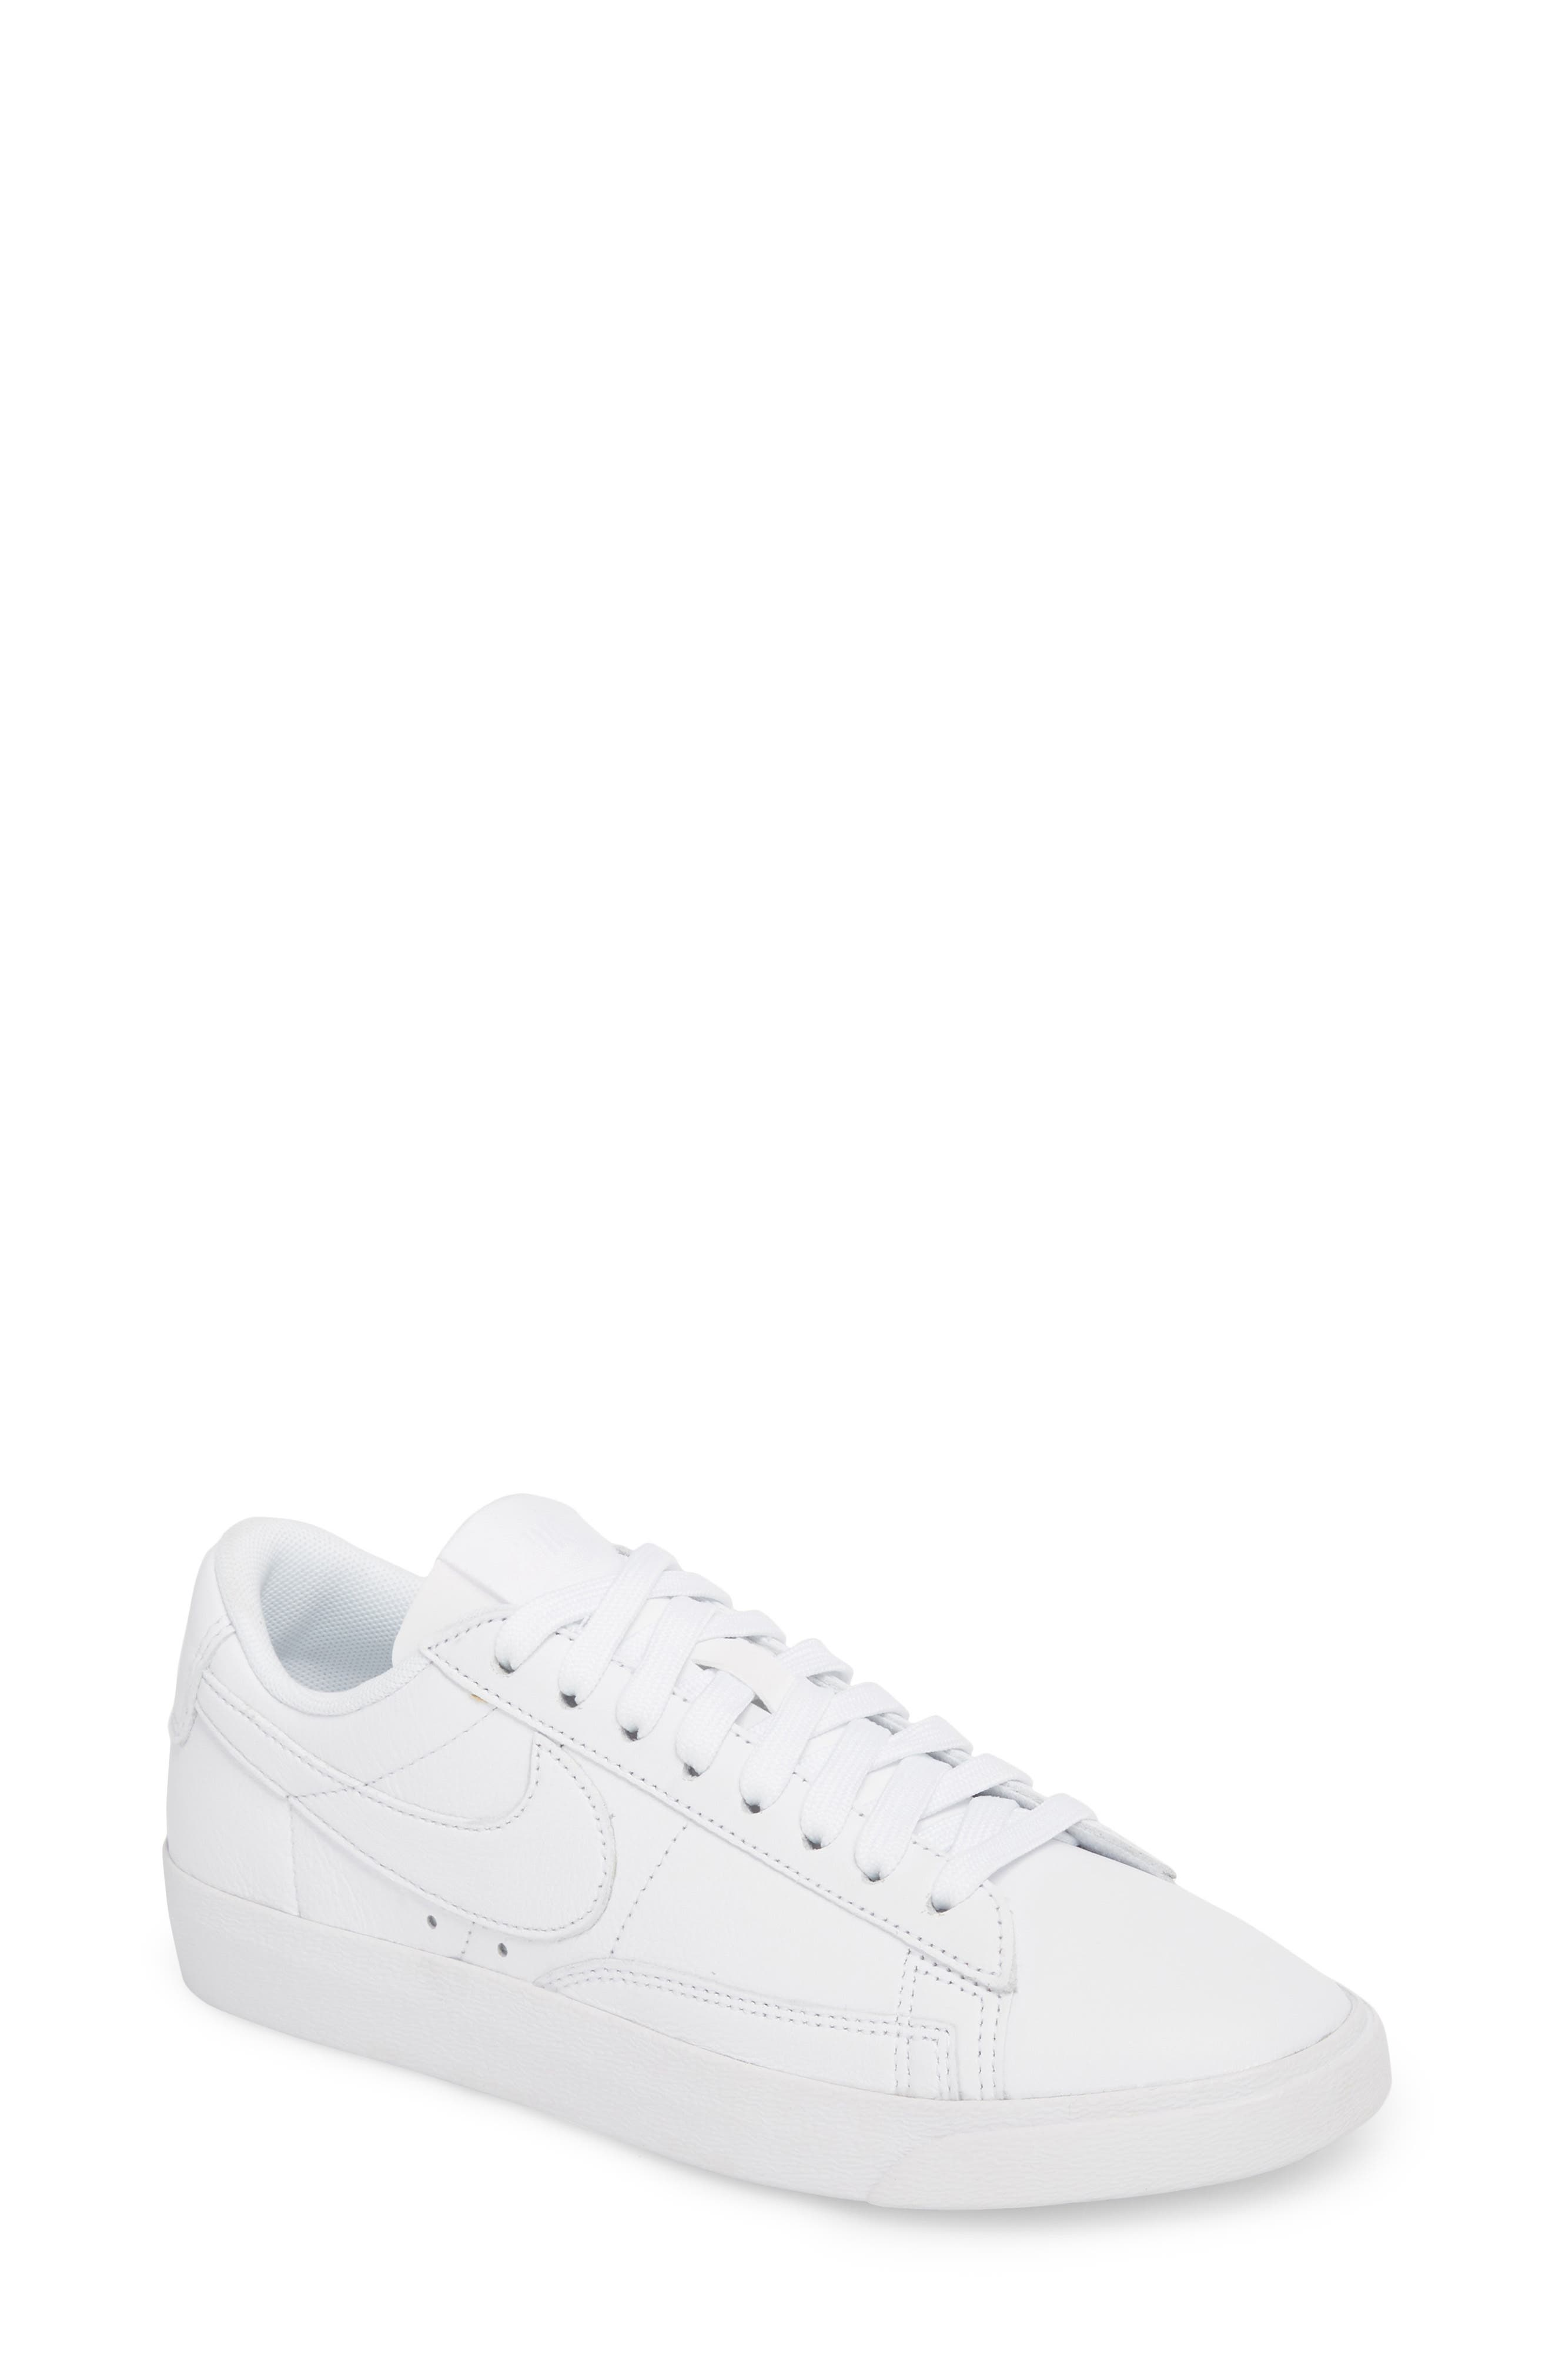 Blazer Low LE Sneaker,                         Main,                         color, WHITE/ WHITE-WHITE